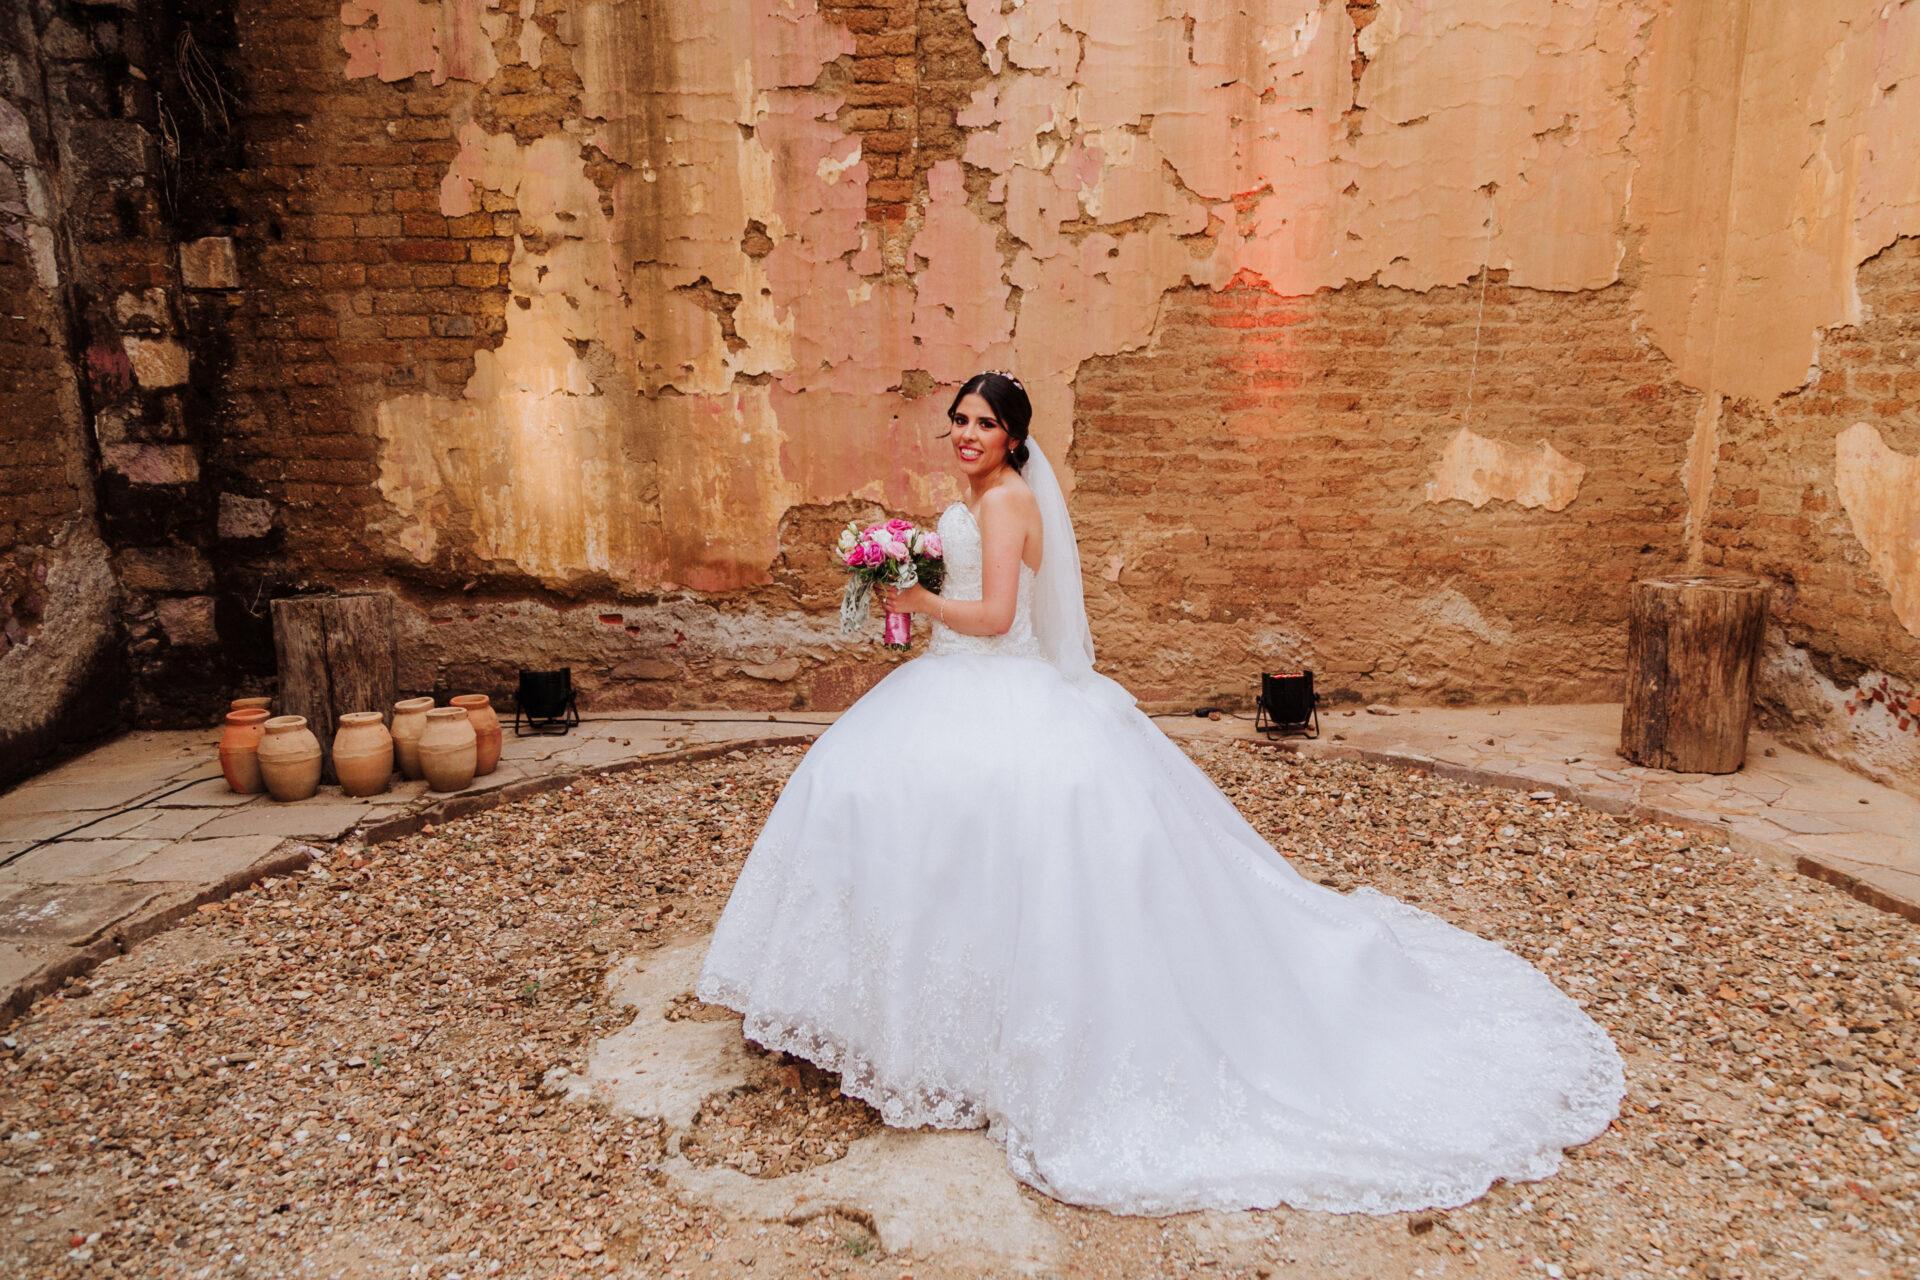 javier_noriega_fotografo_bodas_exhacienda_las_mercedes_zacatecas_wedding_photographer20a